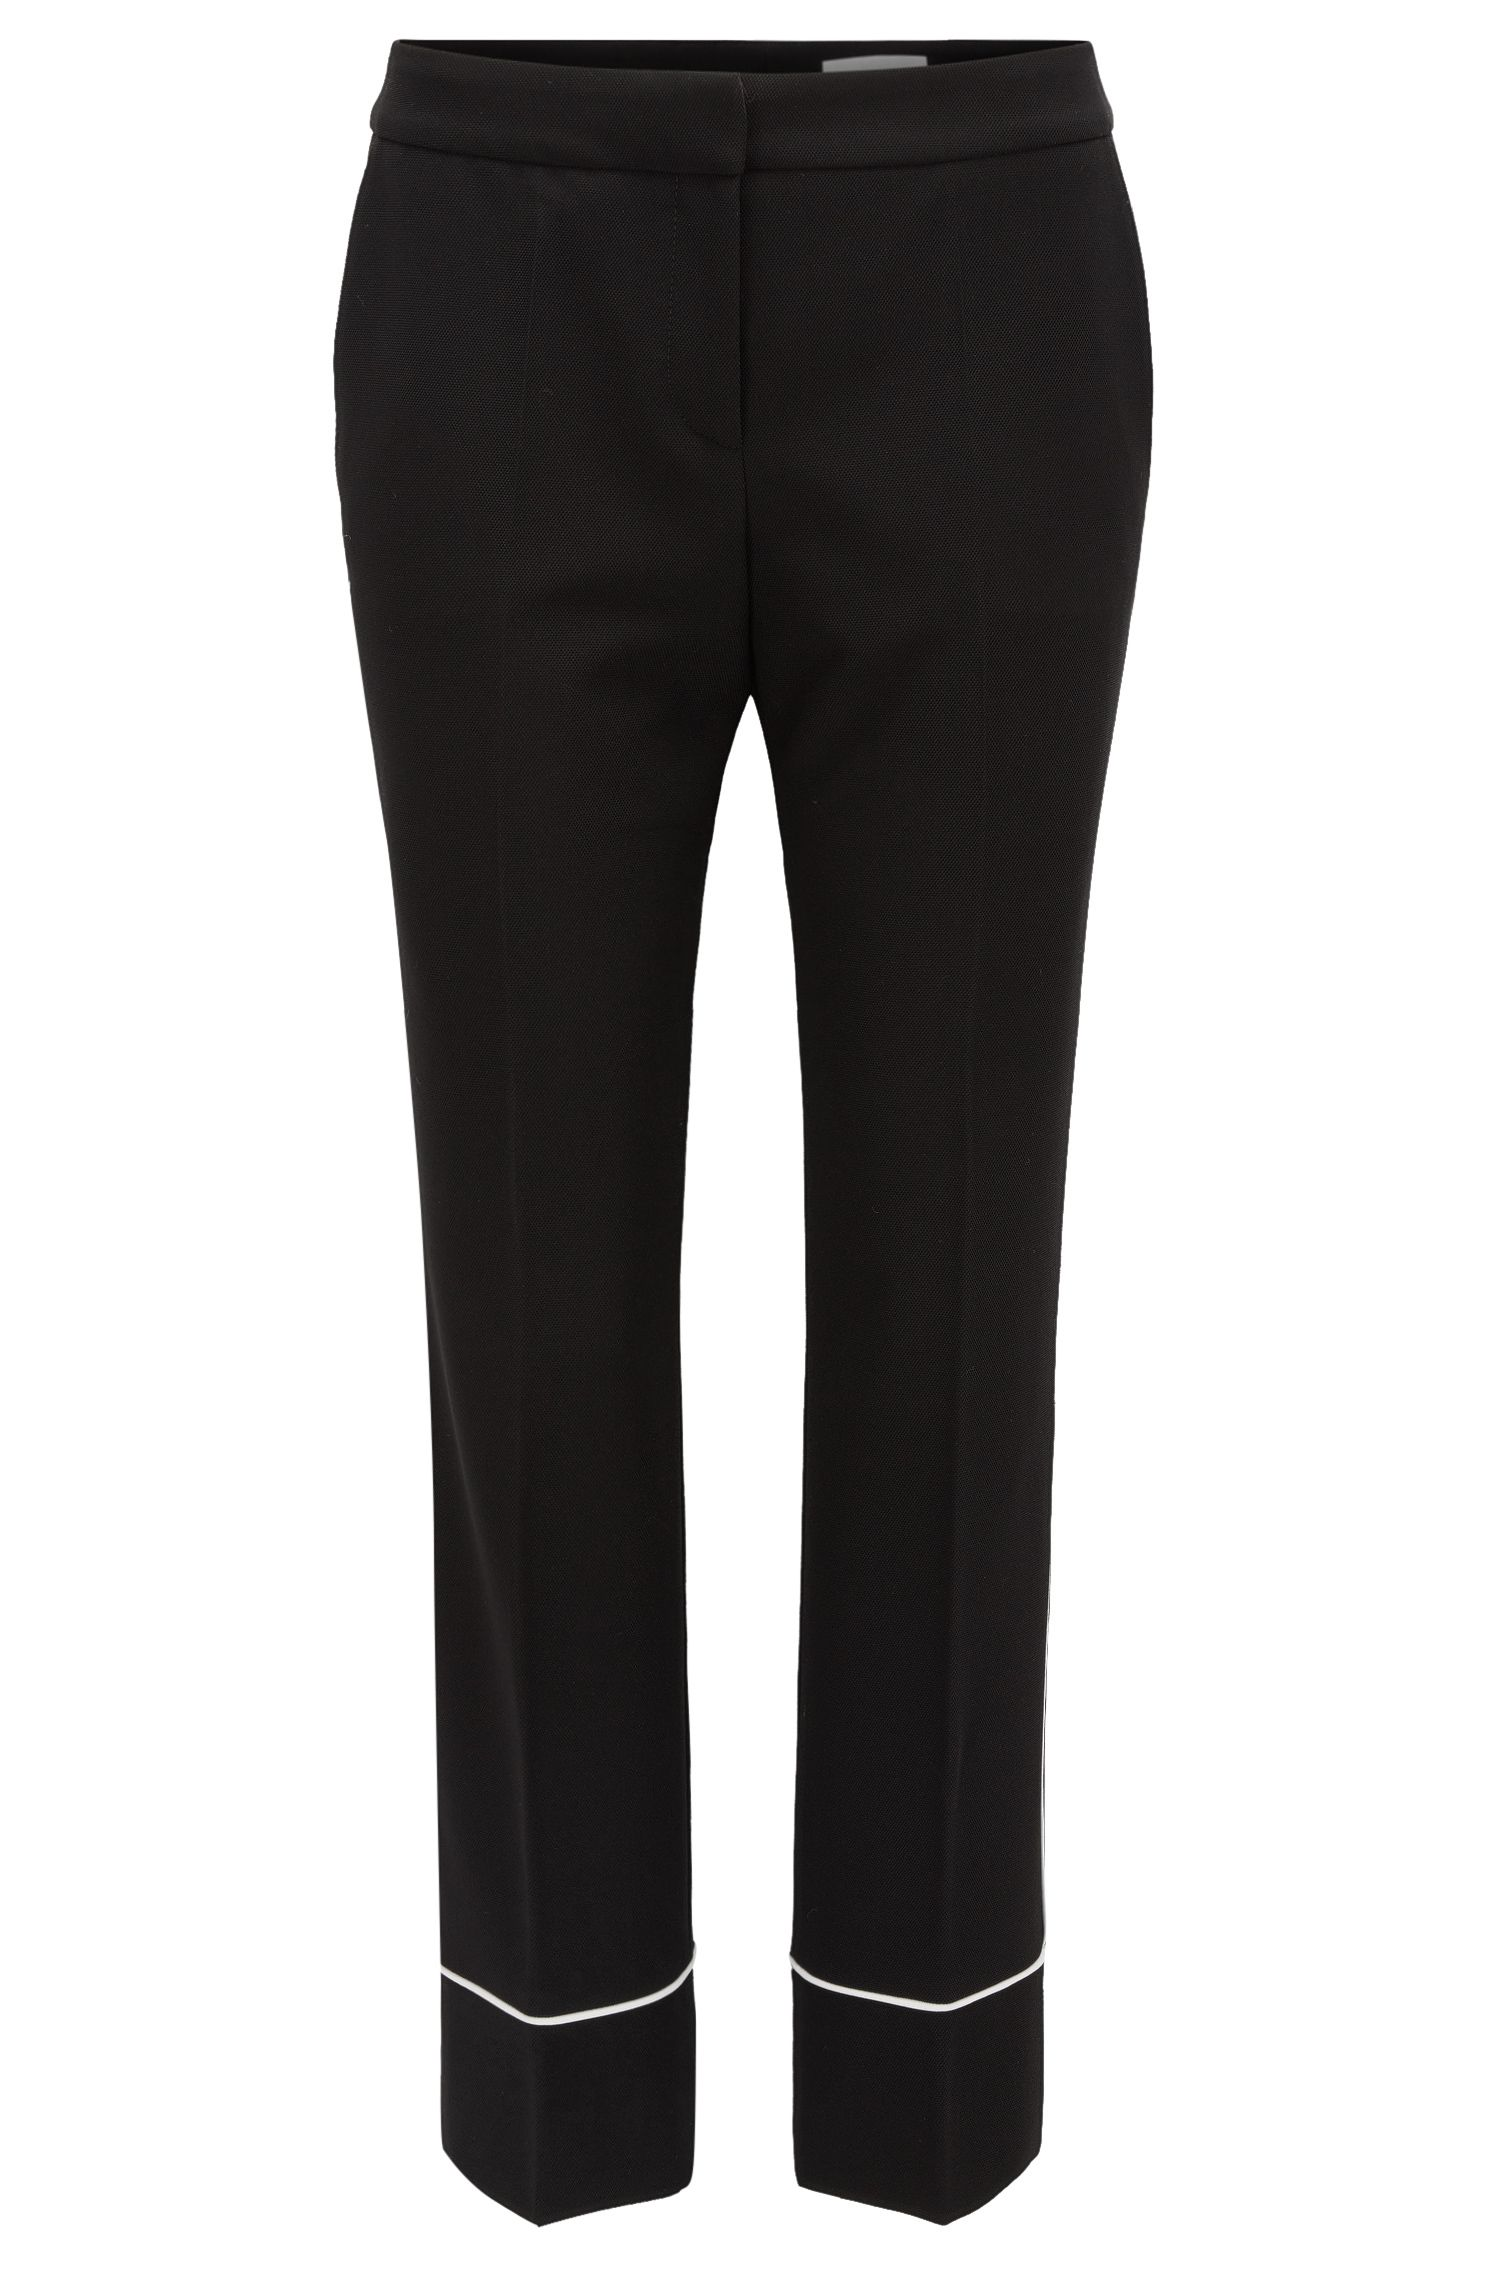 Pantalones capri relaxed fit en suave tejido de punto